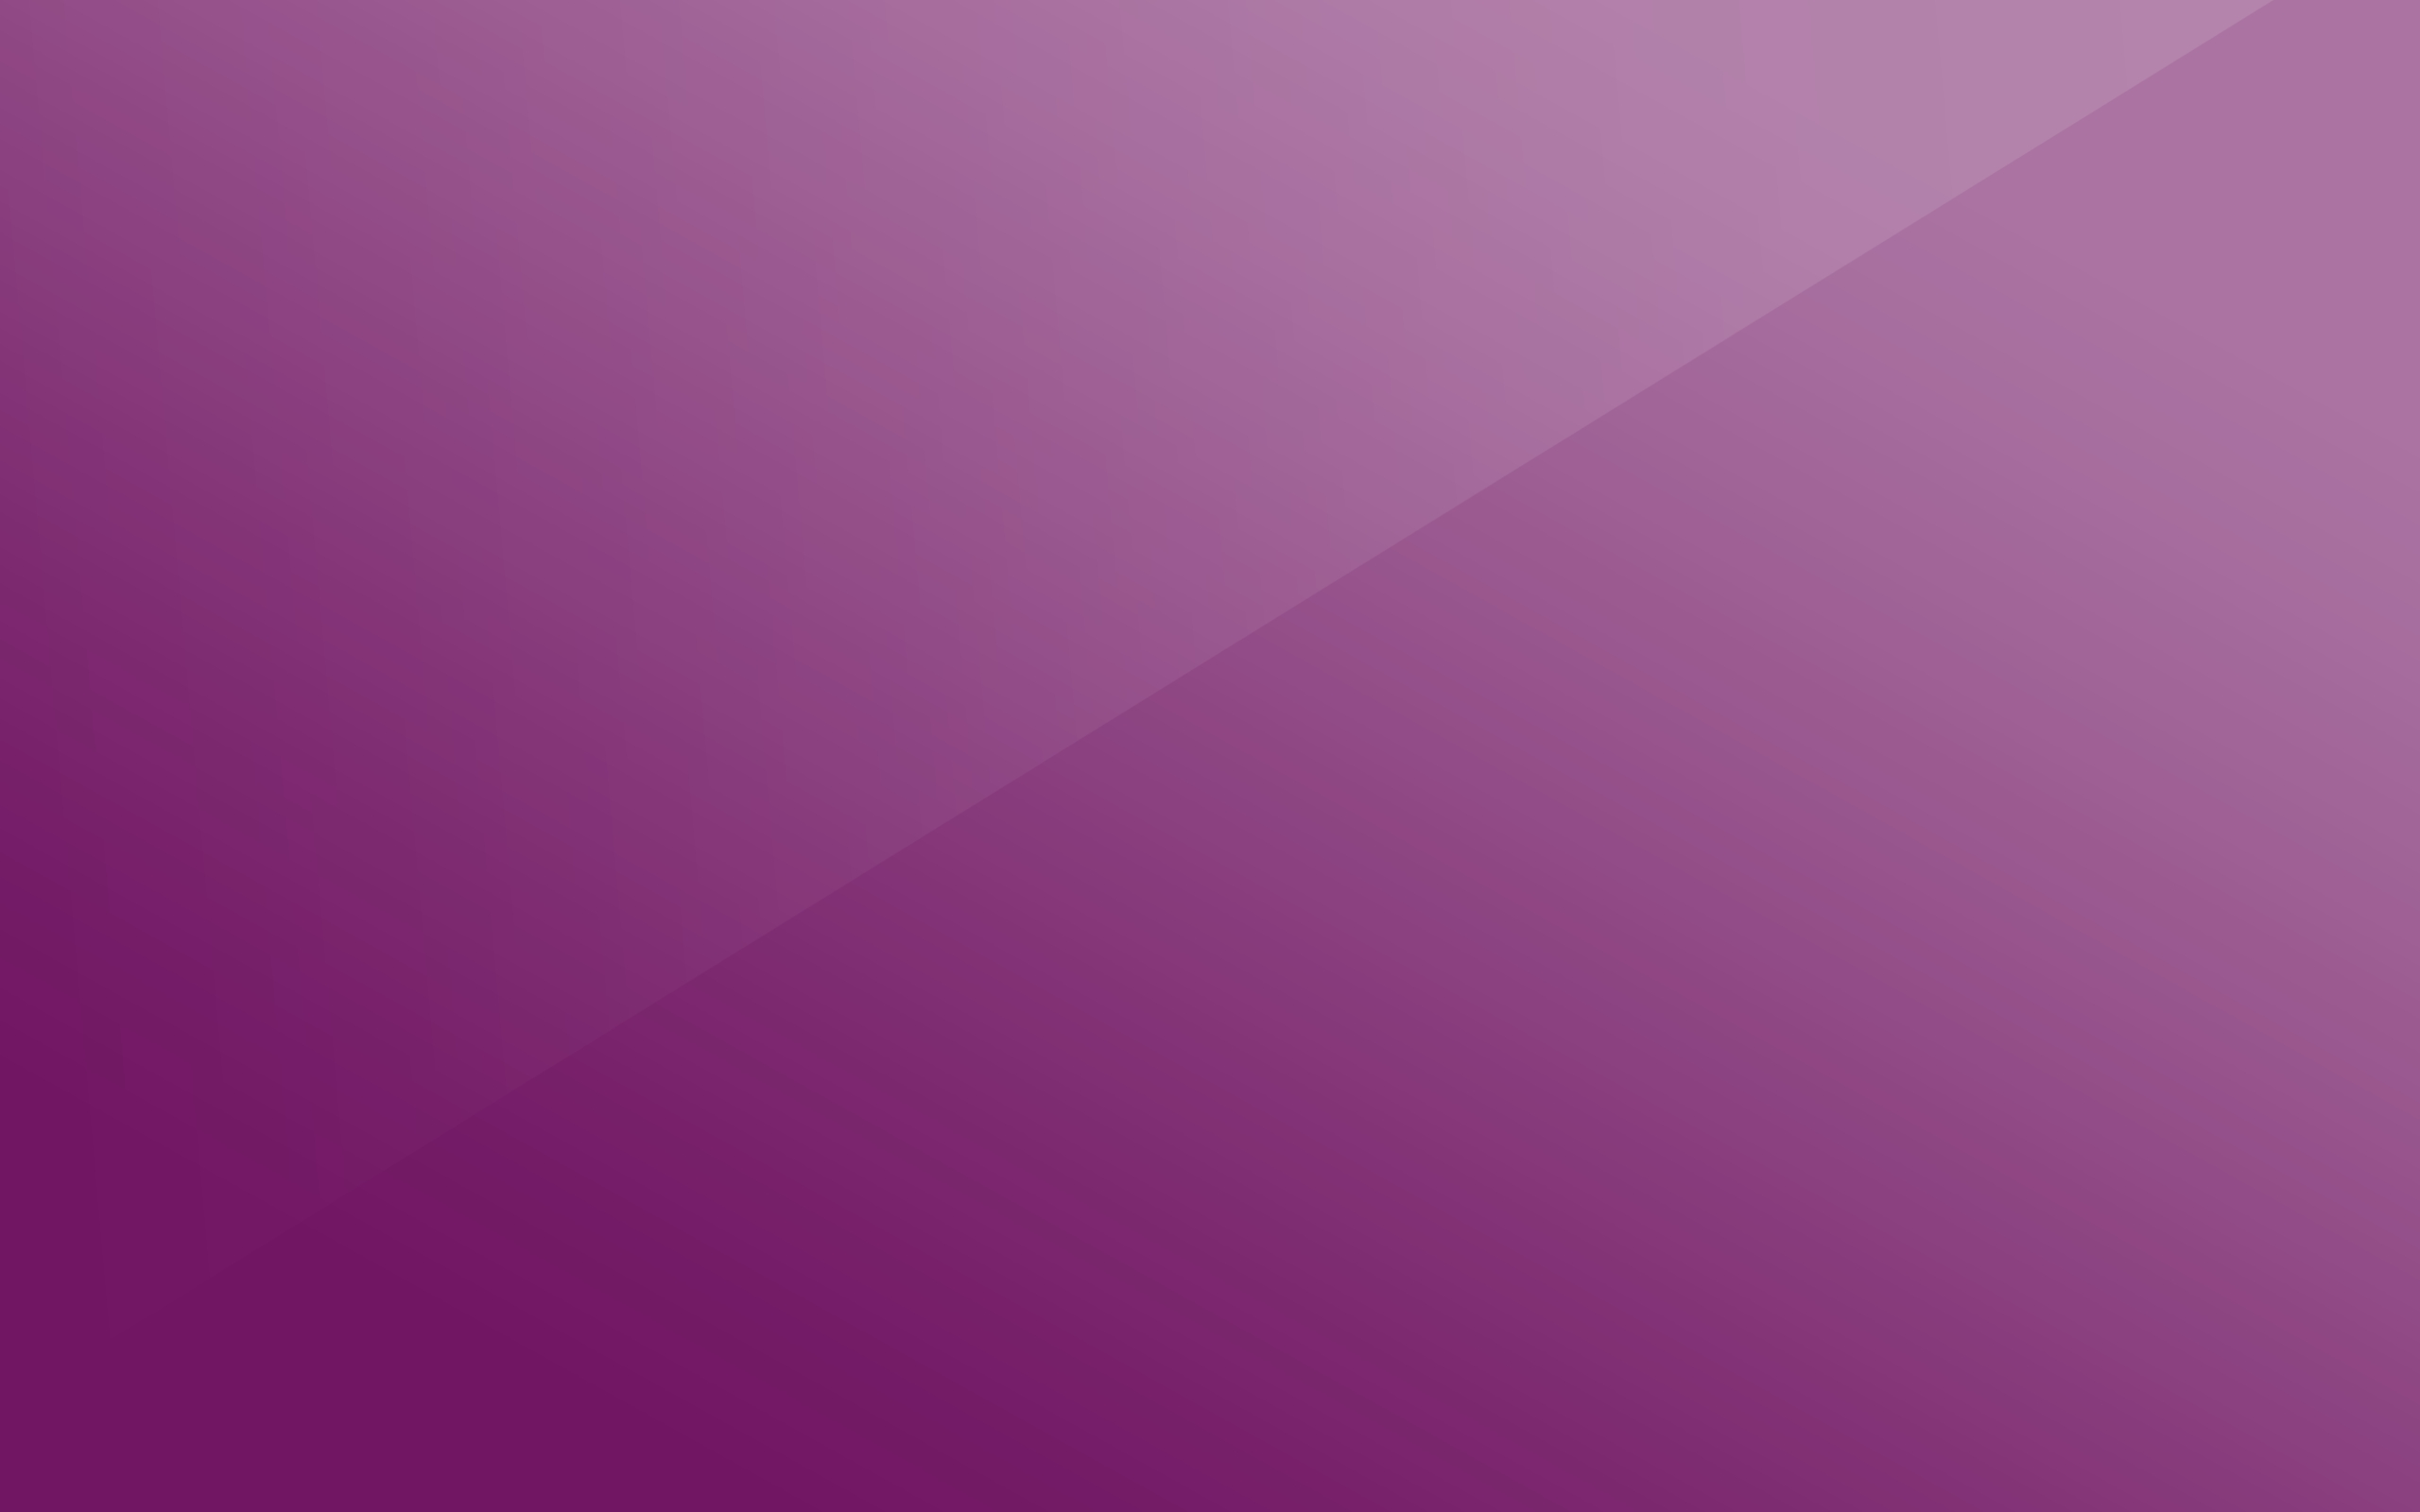 light purple wallpaper 24359